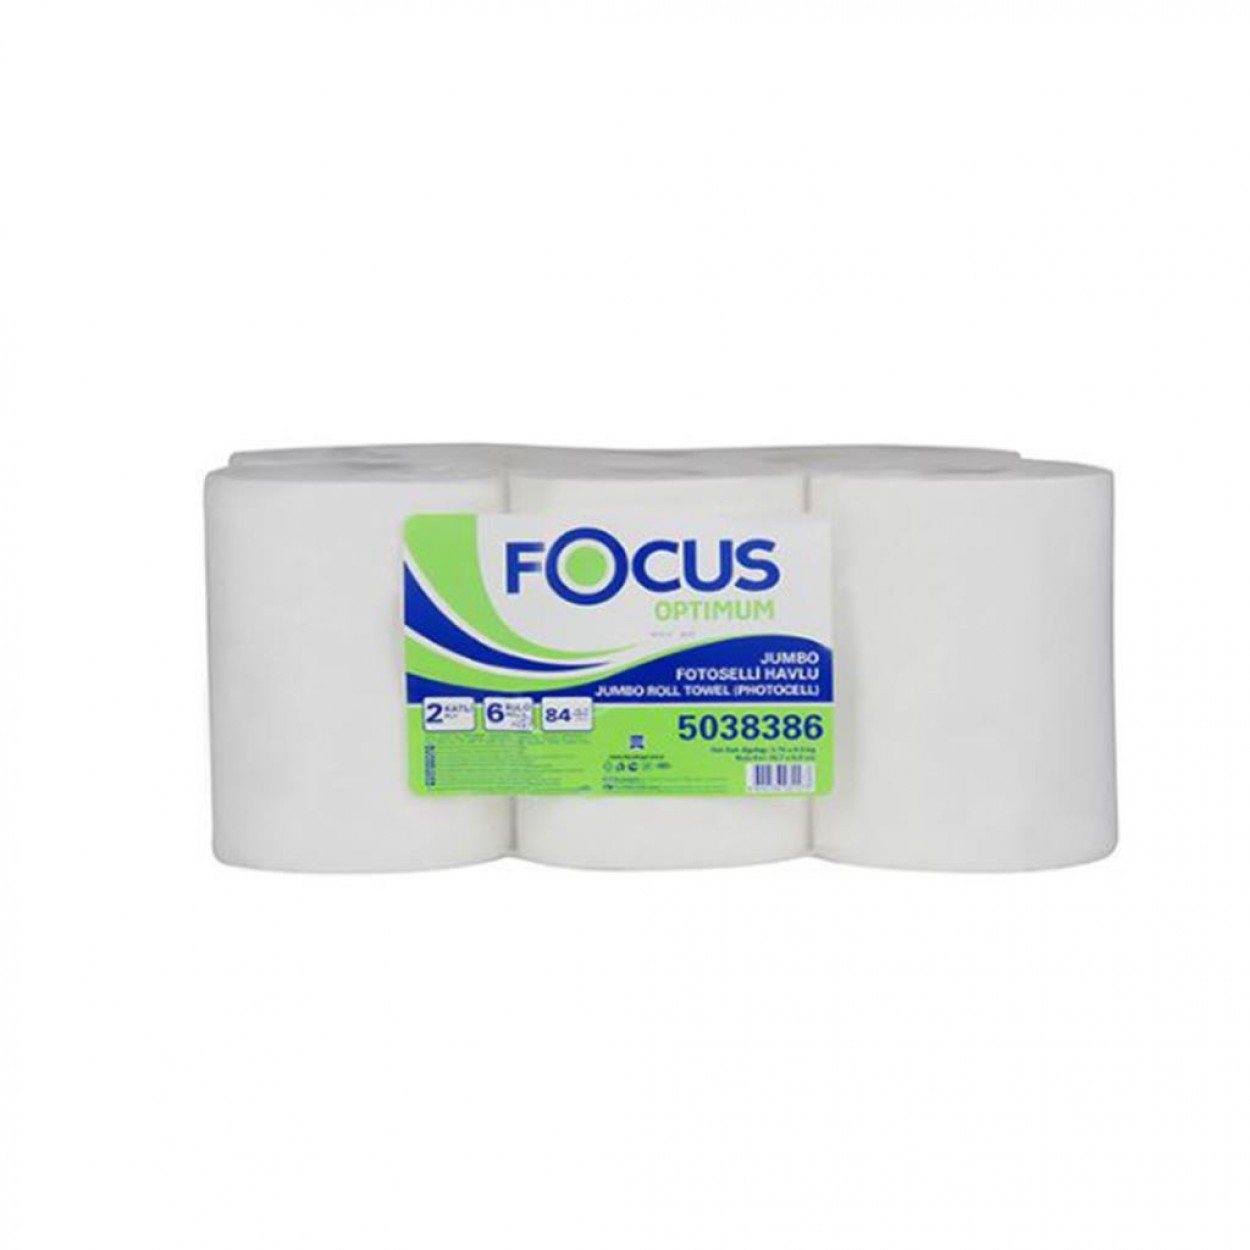 Focus Optimum Hareketli Havlu 21 cm 6 Rulo